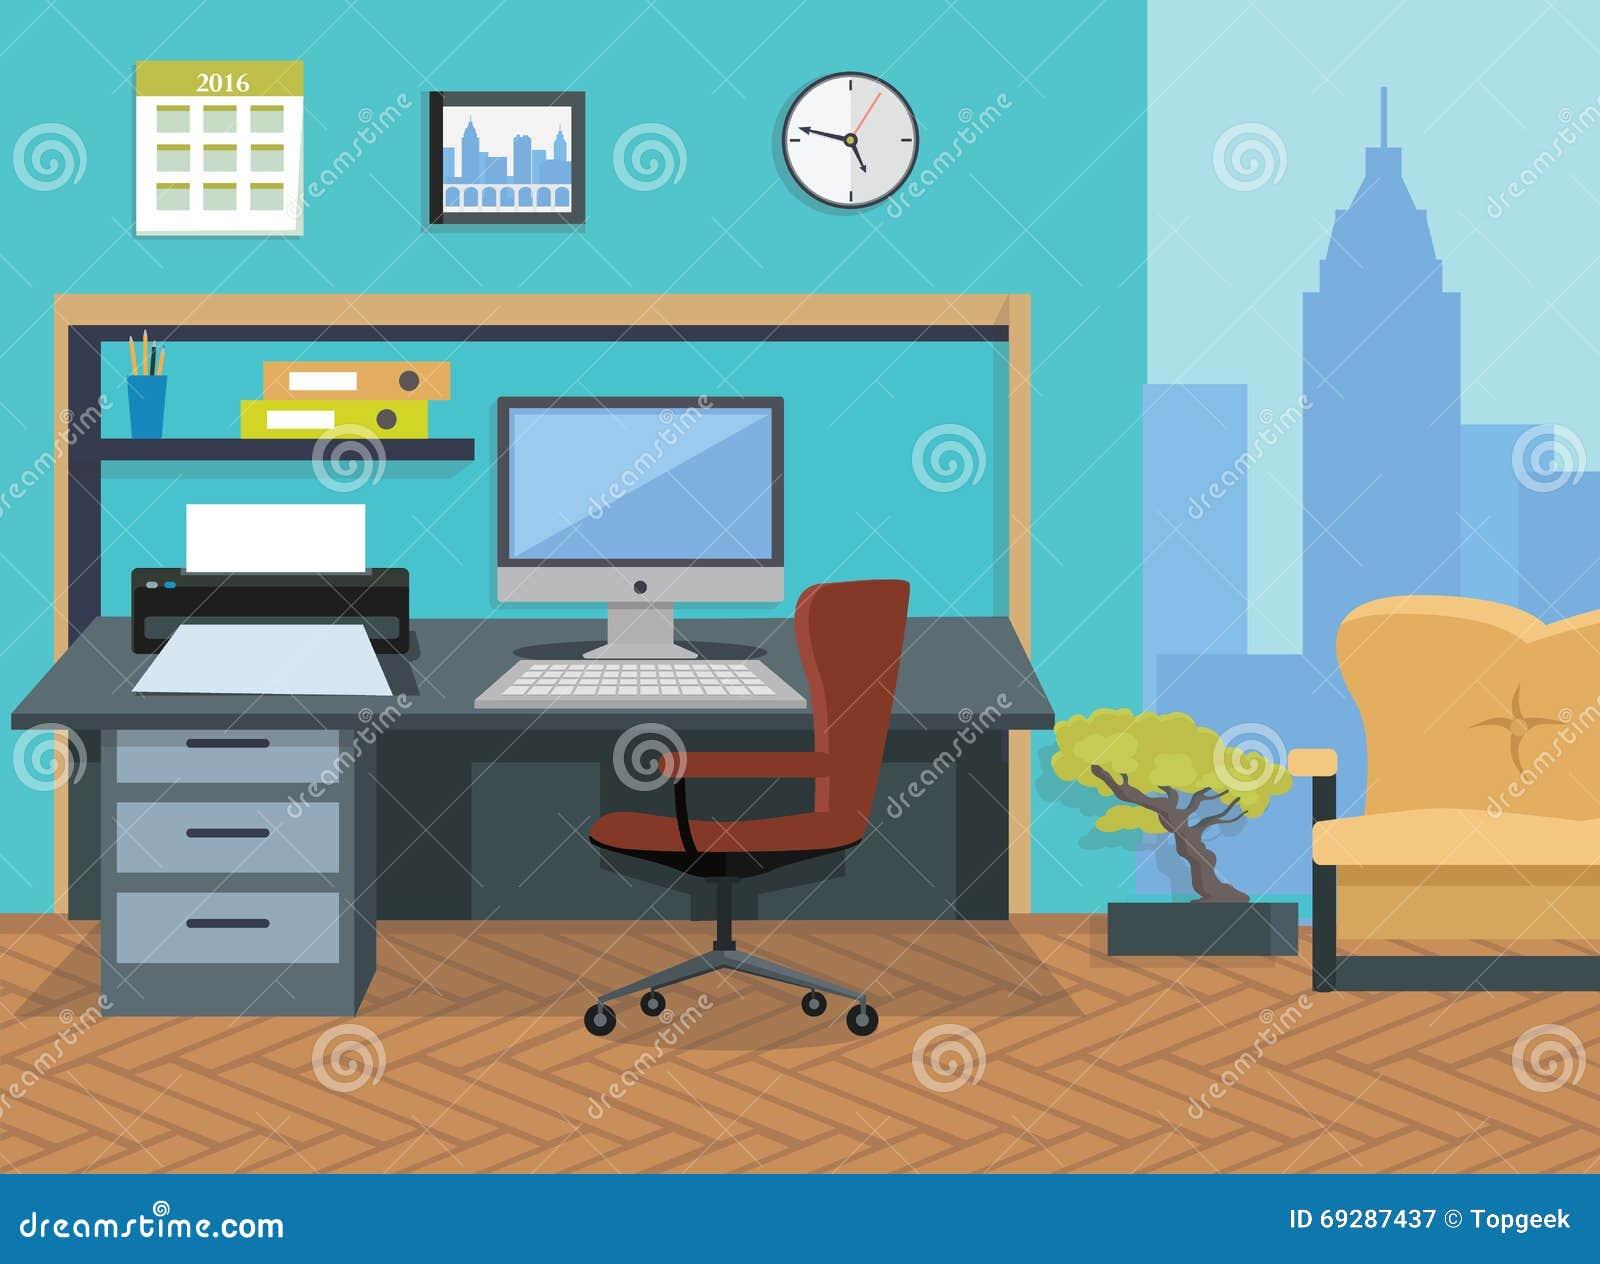 Interior Office Room Illustration For Design Stock Vector